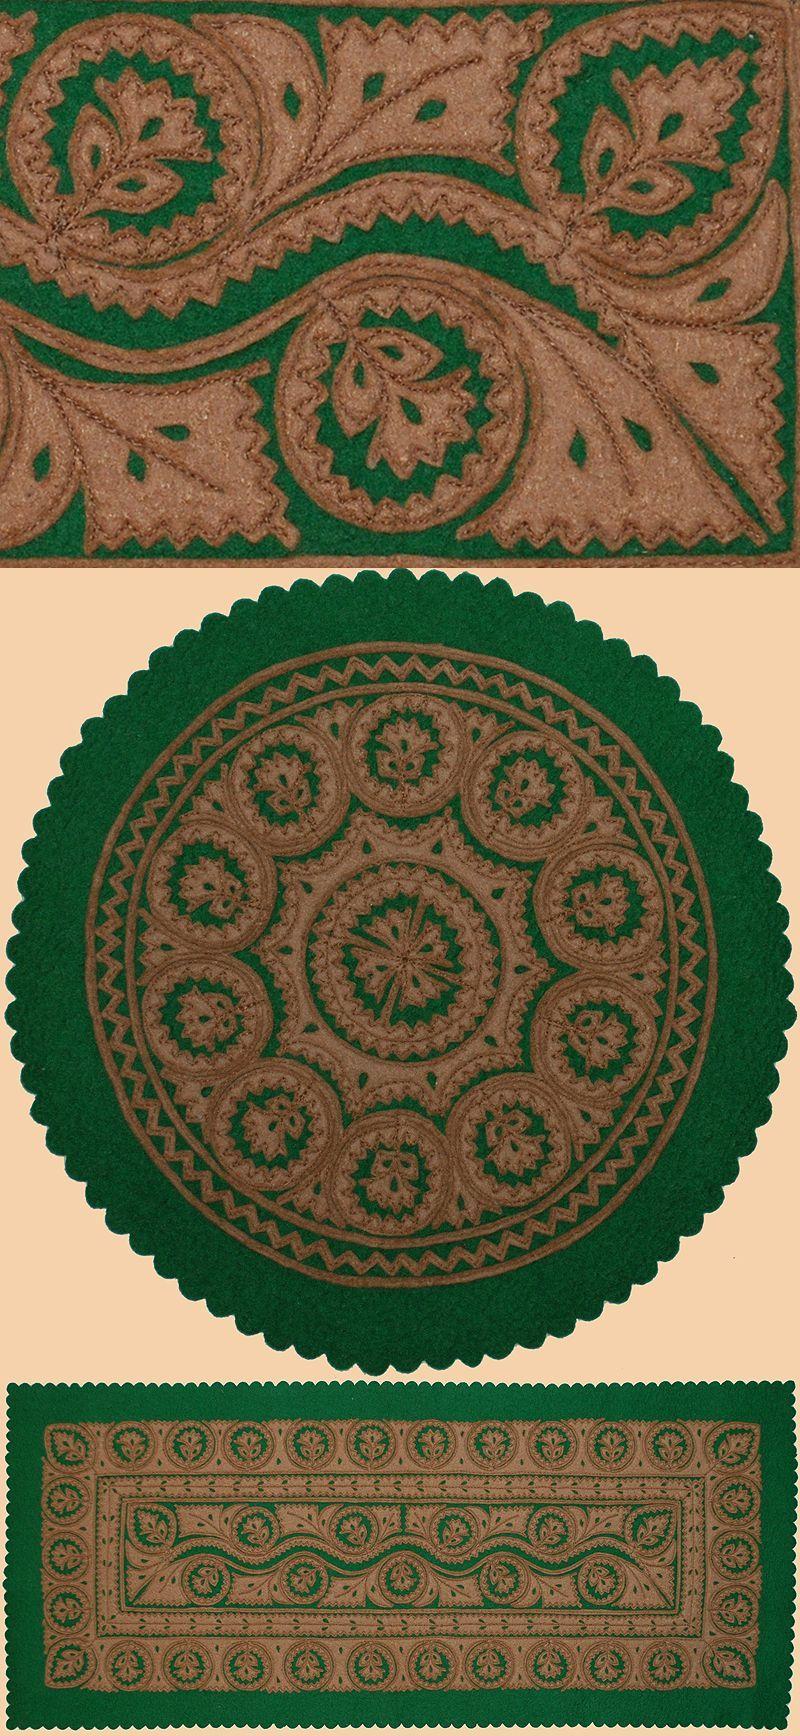 European Textiles - TextileAsArt.com 4005a0adc0